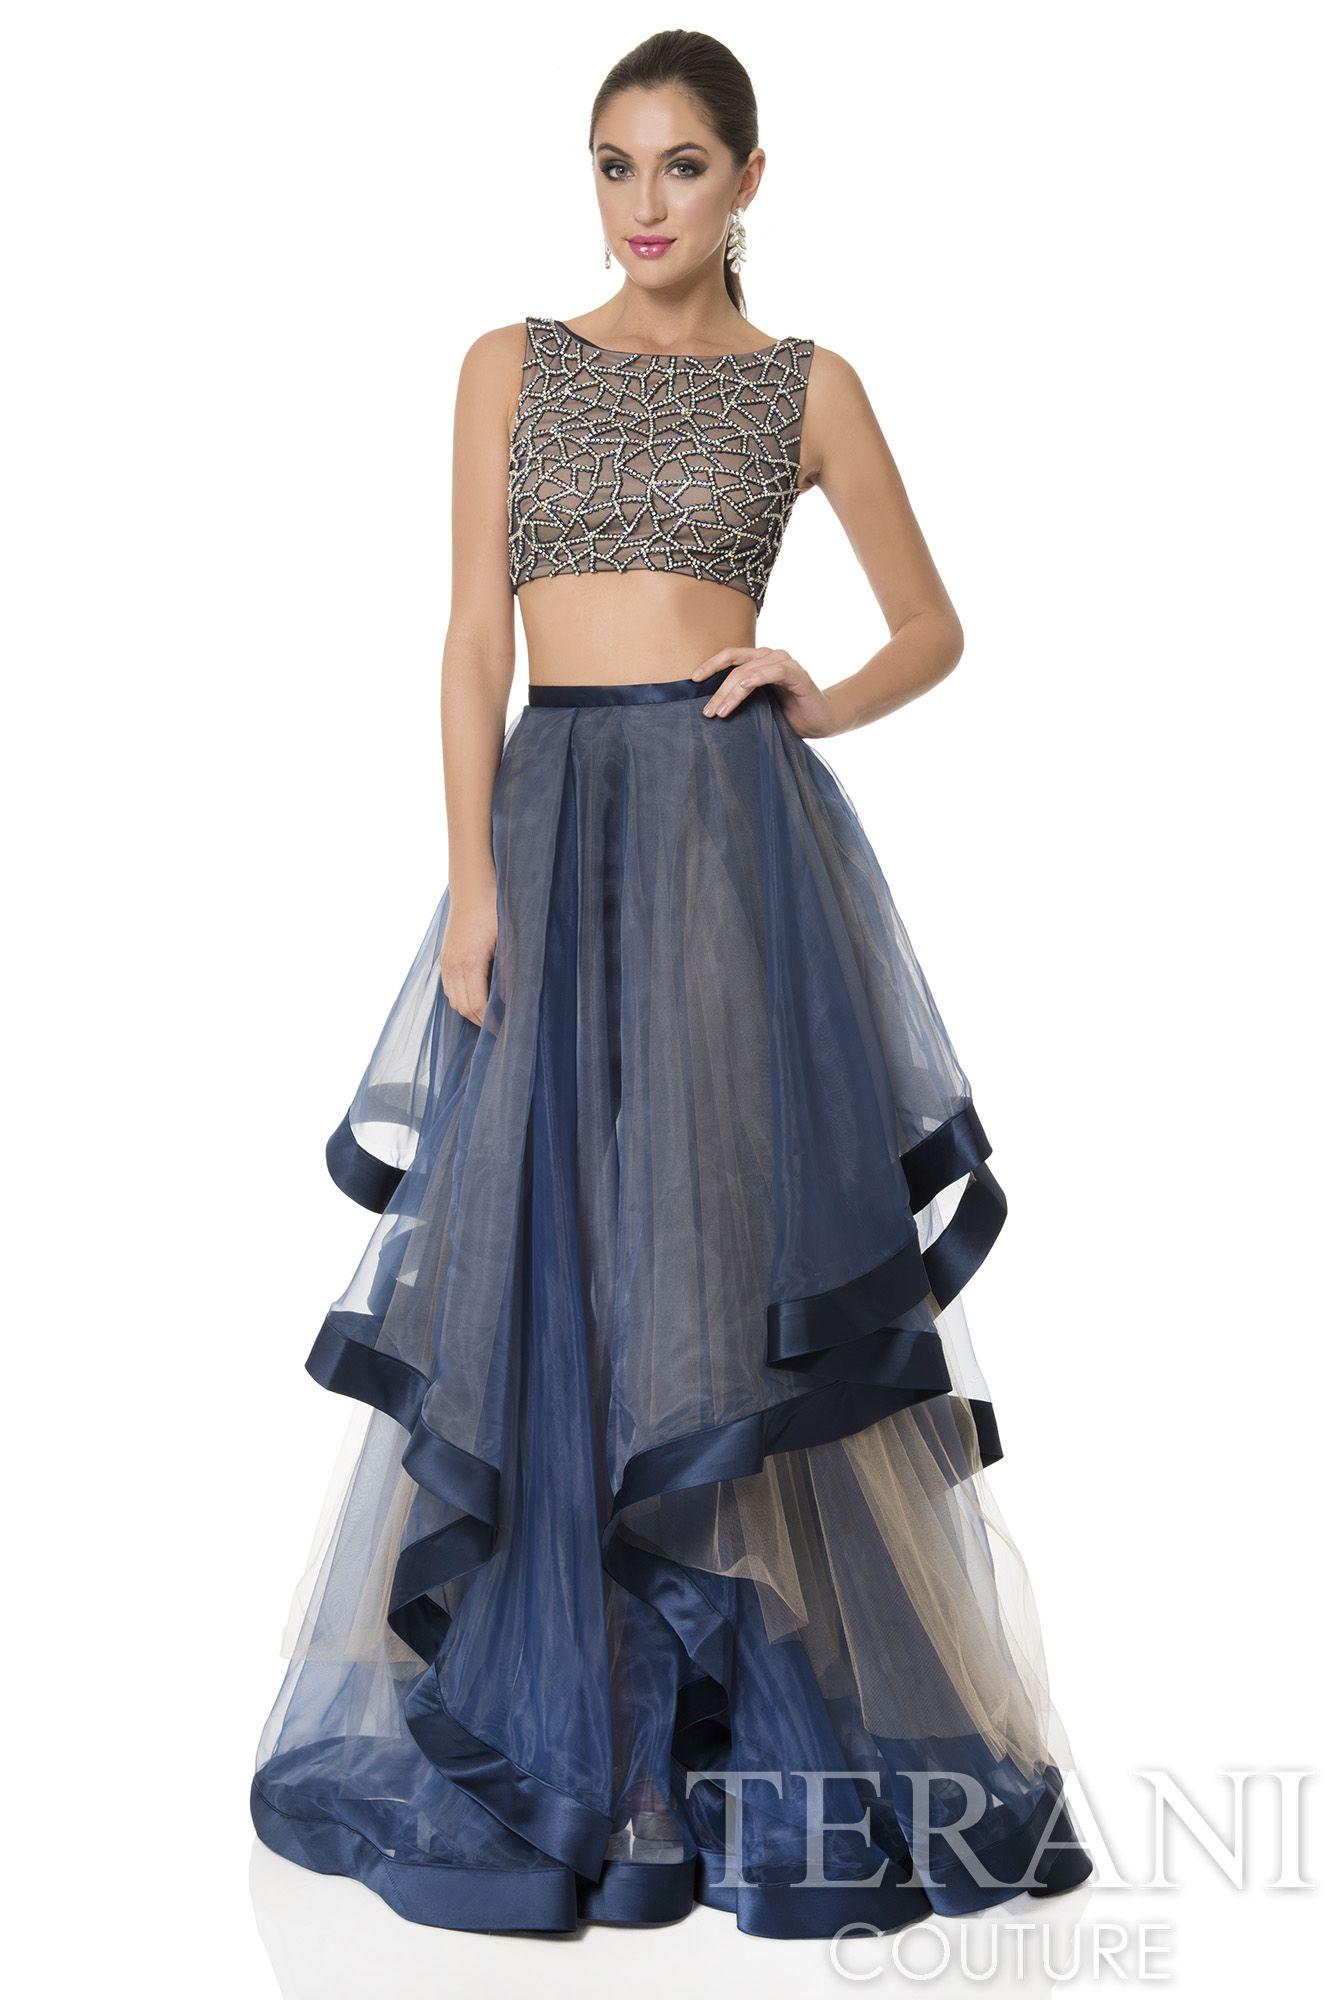 Terani Couture Prom Dress Sheer Illusion Spaghetti Stap